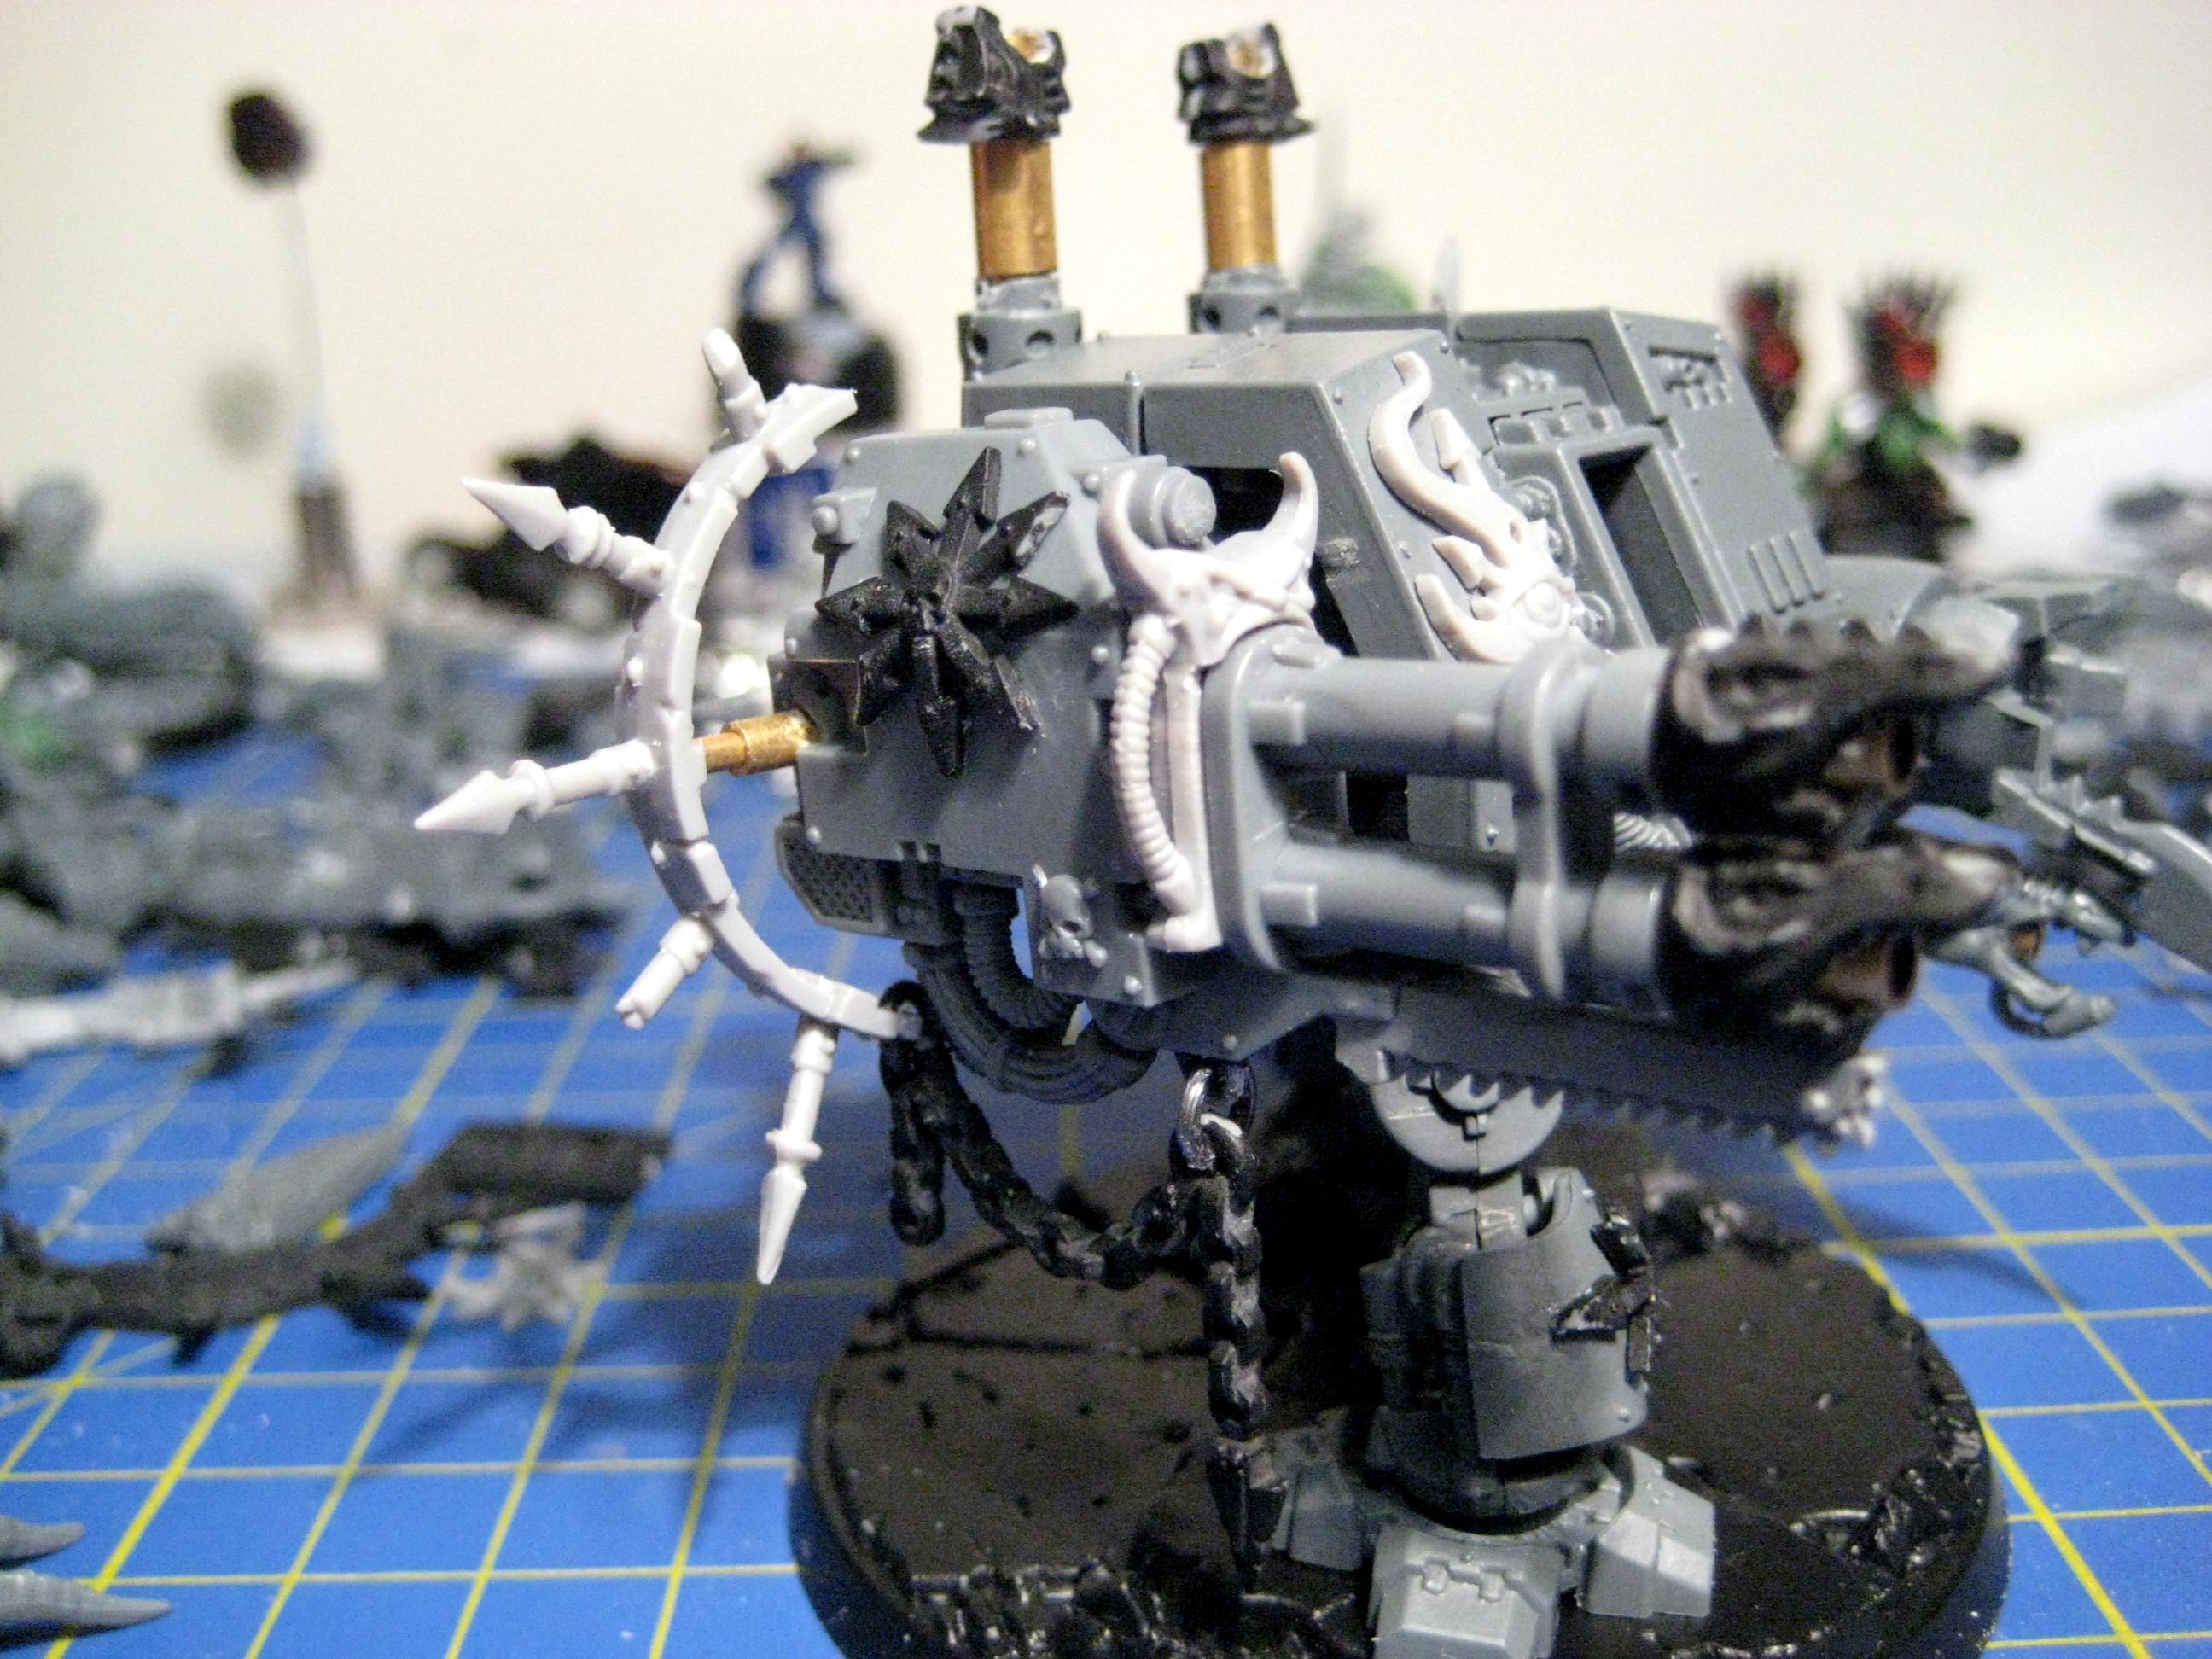 Chaos, Dreadnought, Chaos Dreadnought